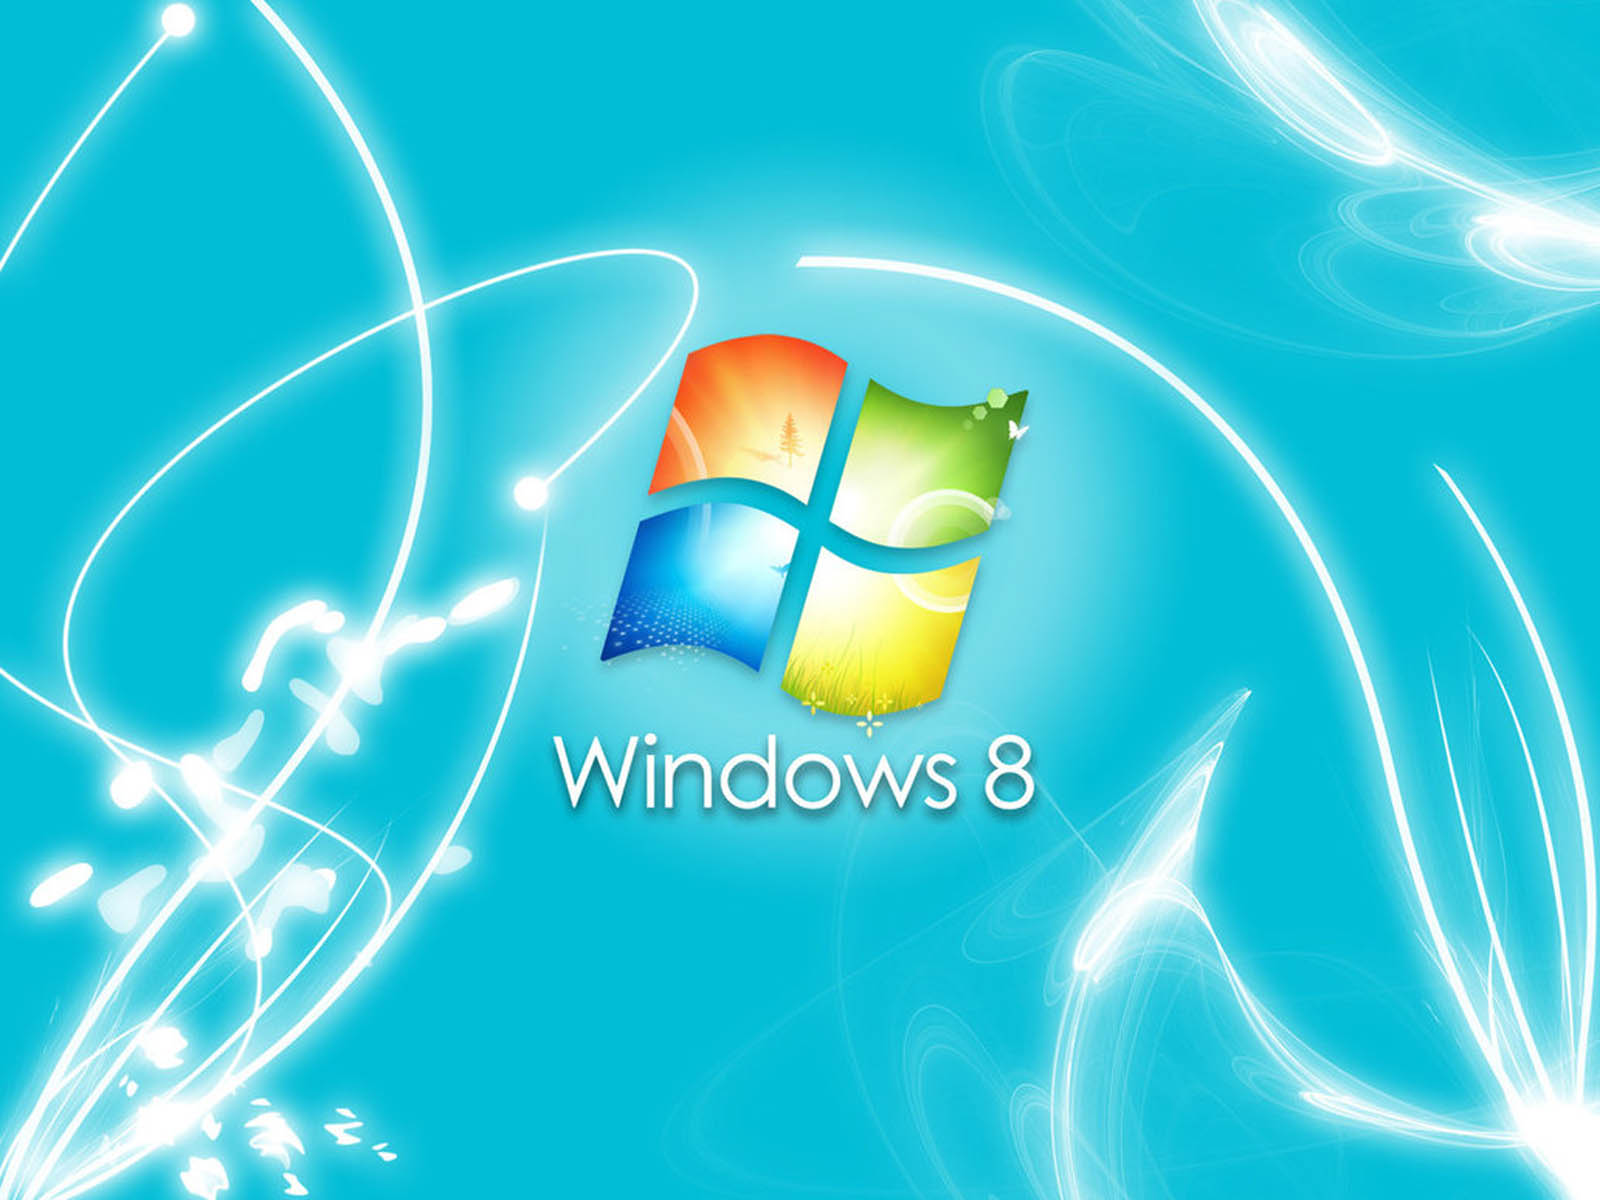 Windows 8 Desktop Wallpapers and Backgrounds Wallpaper 1600x1200